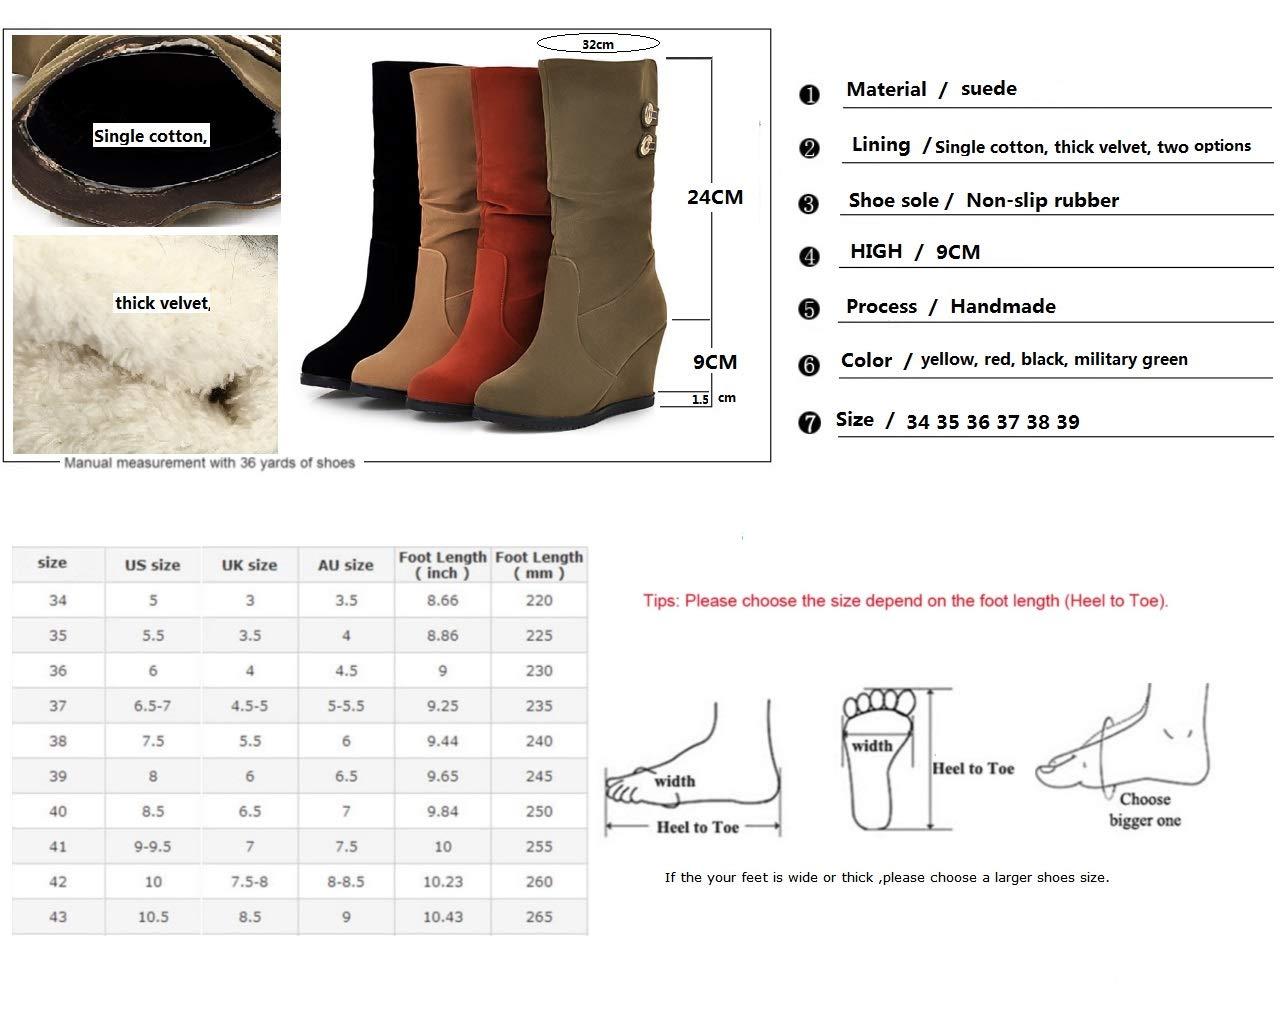 SHANGWU Damen Damen Keilstiefel Kalb Trainer Lässige Stiefel Winter Pelz Pelz Pelz Gefüttert Griffsohle Komfortable Warme Größe Reiter Dicke Turnschuhe e1c58d